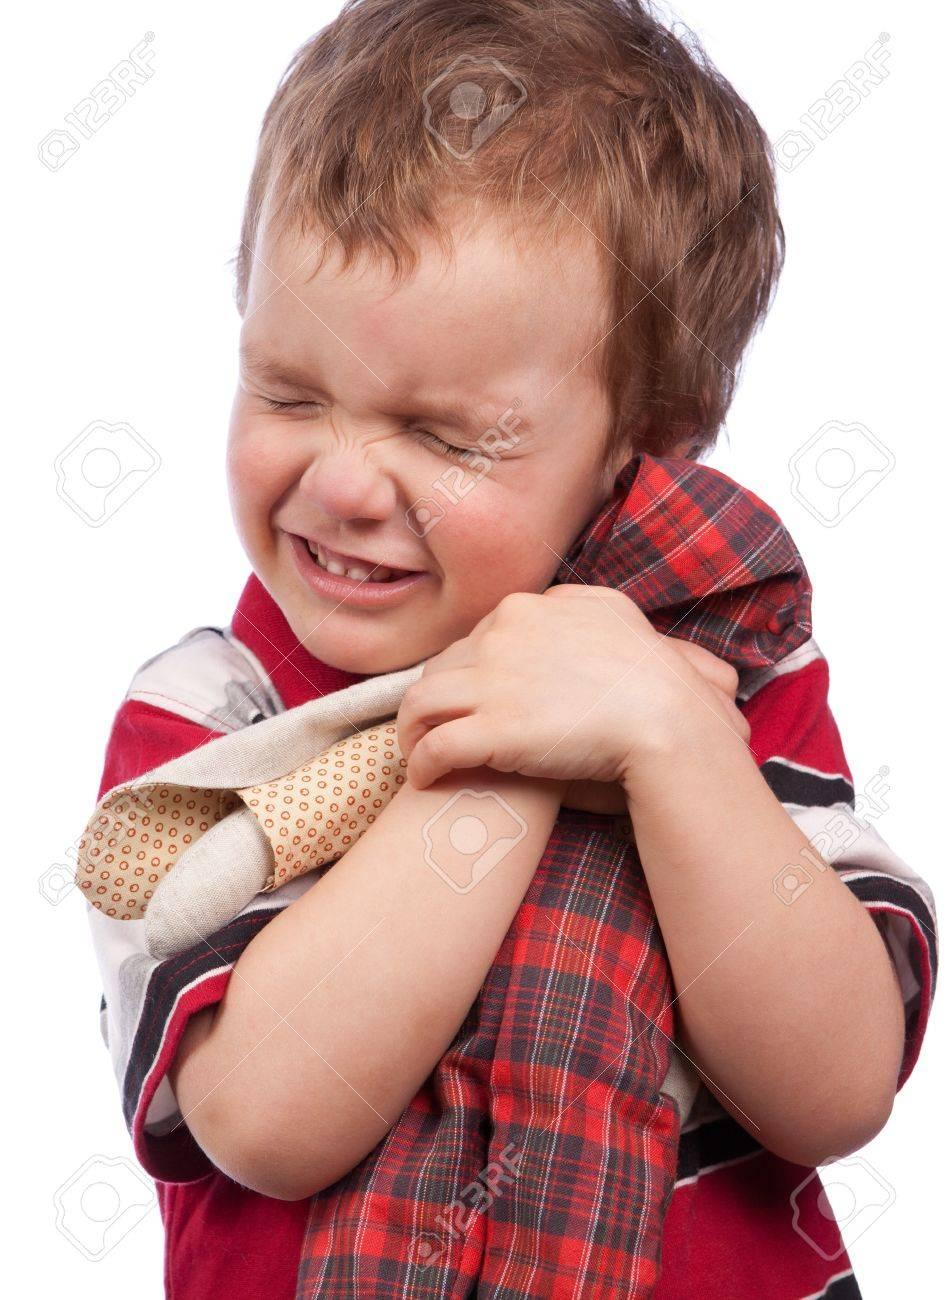 The little boy cuddle toy, isolation Stock Photo - 15036981